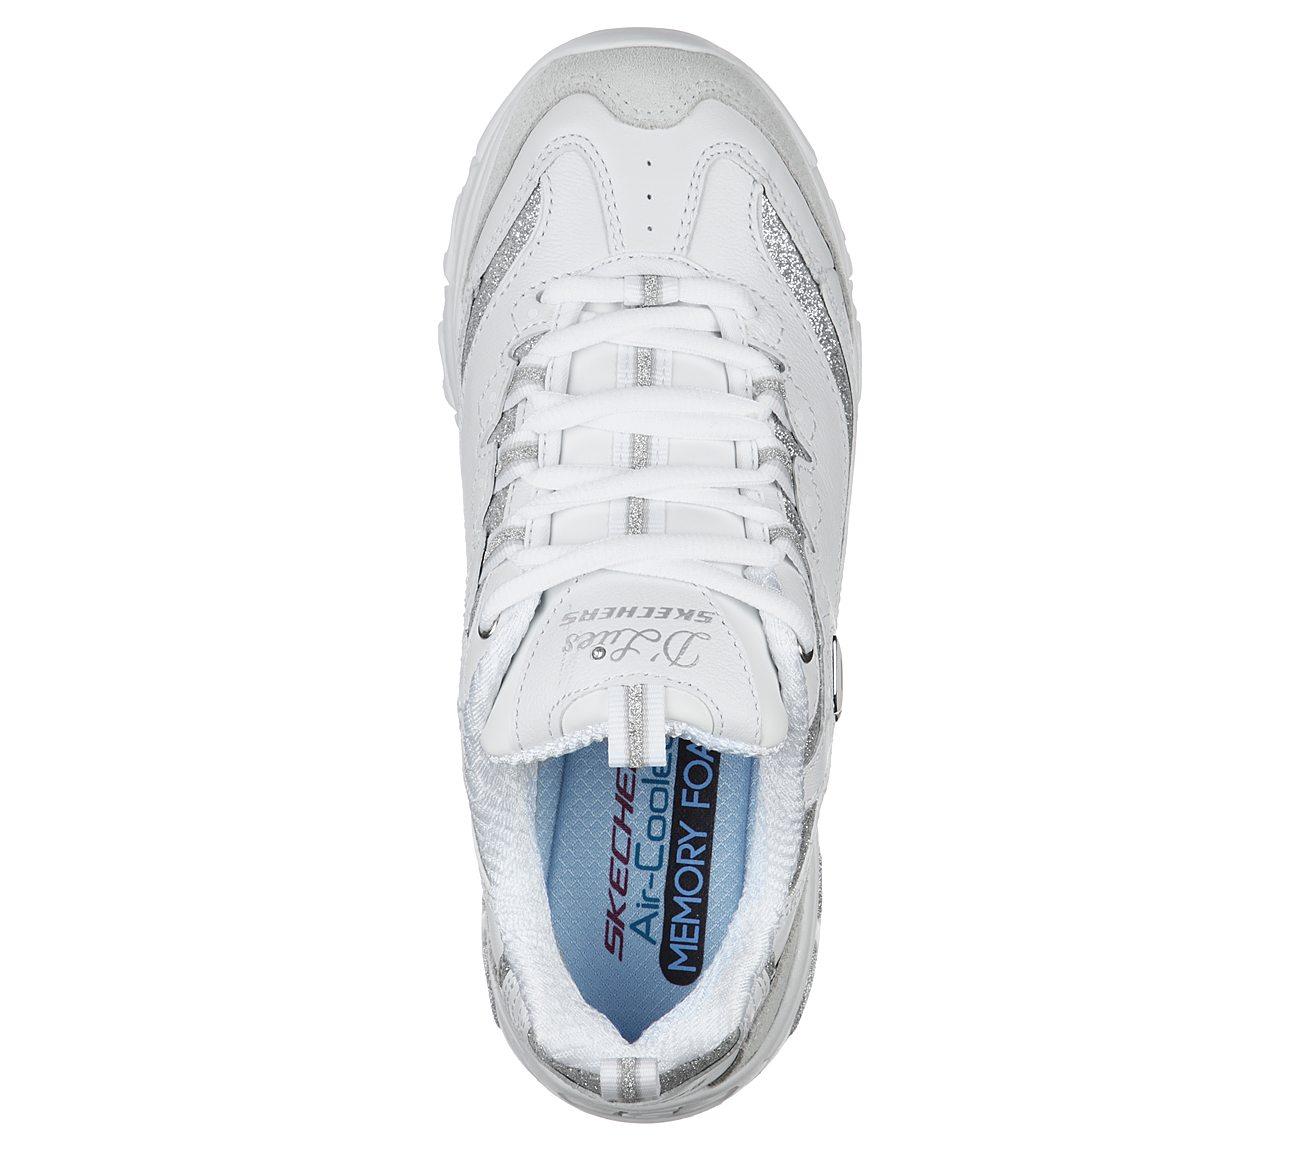 Buy SKECHERS D'Lites Glimmer Eve D'Lites Shoes YOeoF